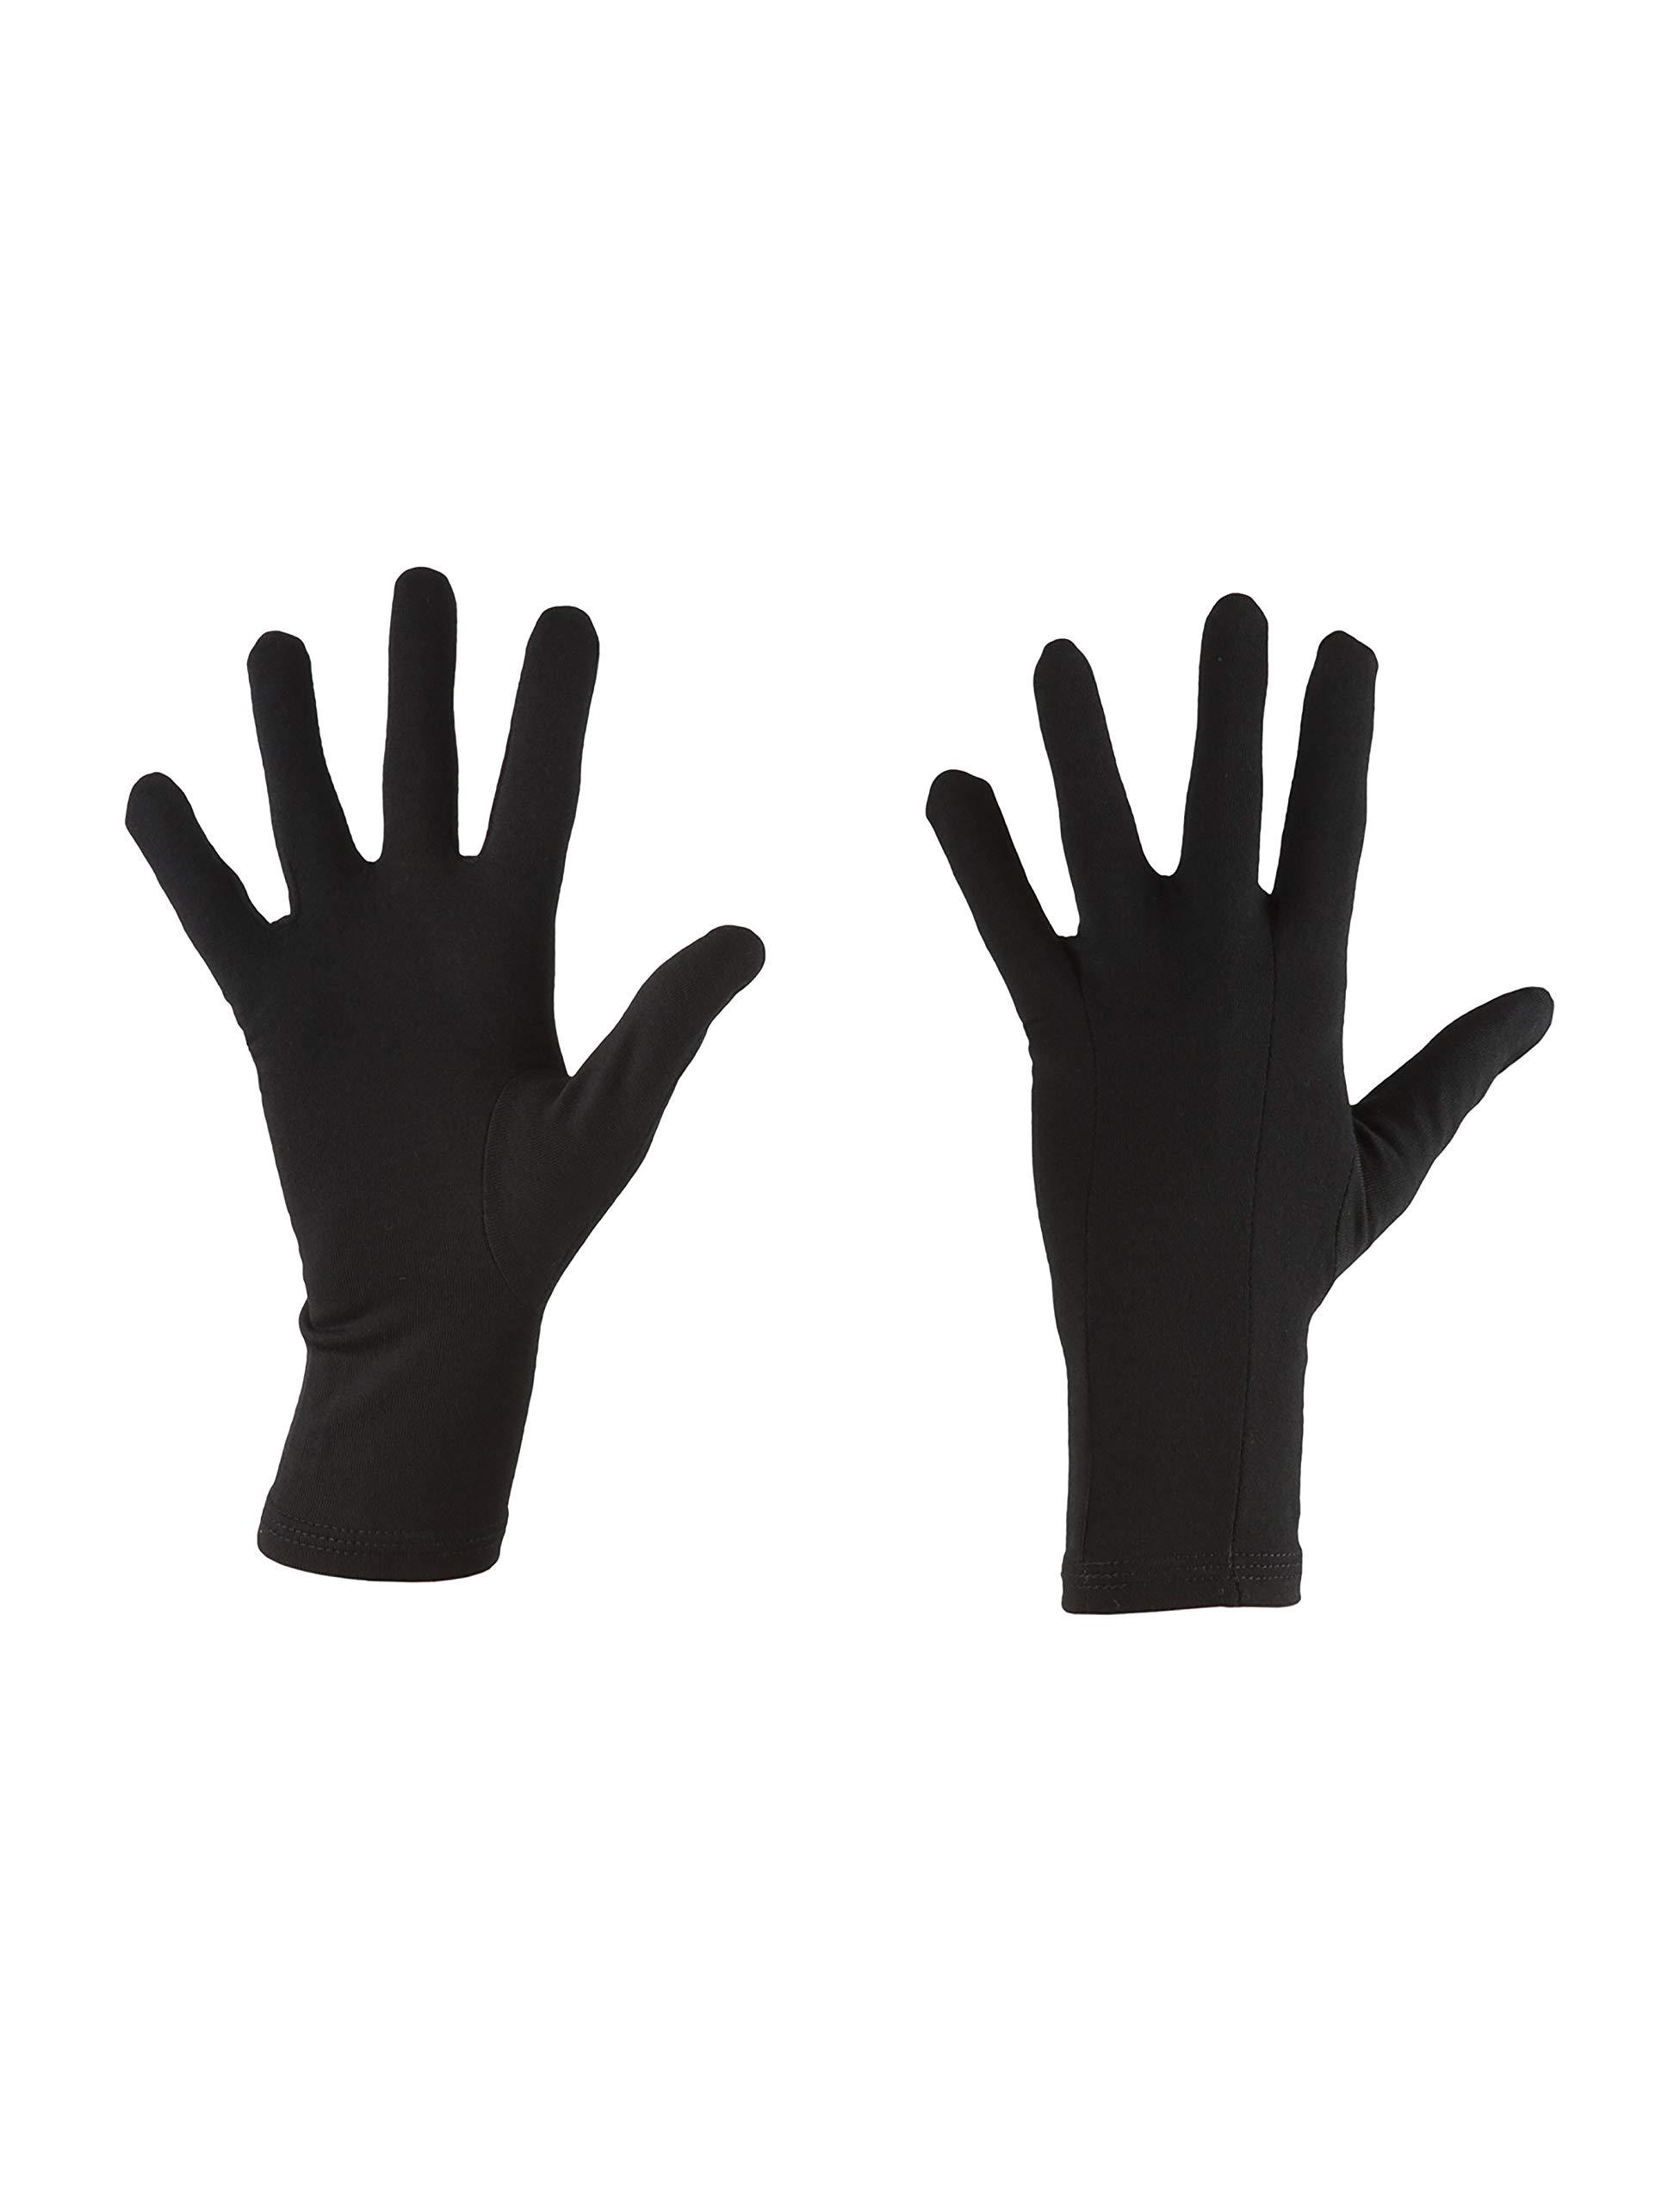 Icebreaker Merino Unisex Adult 200 Oasis Glove Liner, Black, L by Icebreaker Merino (Image #1)